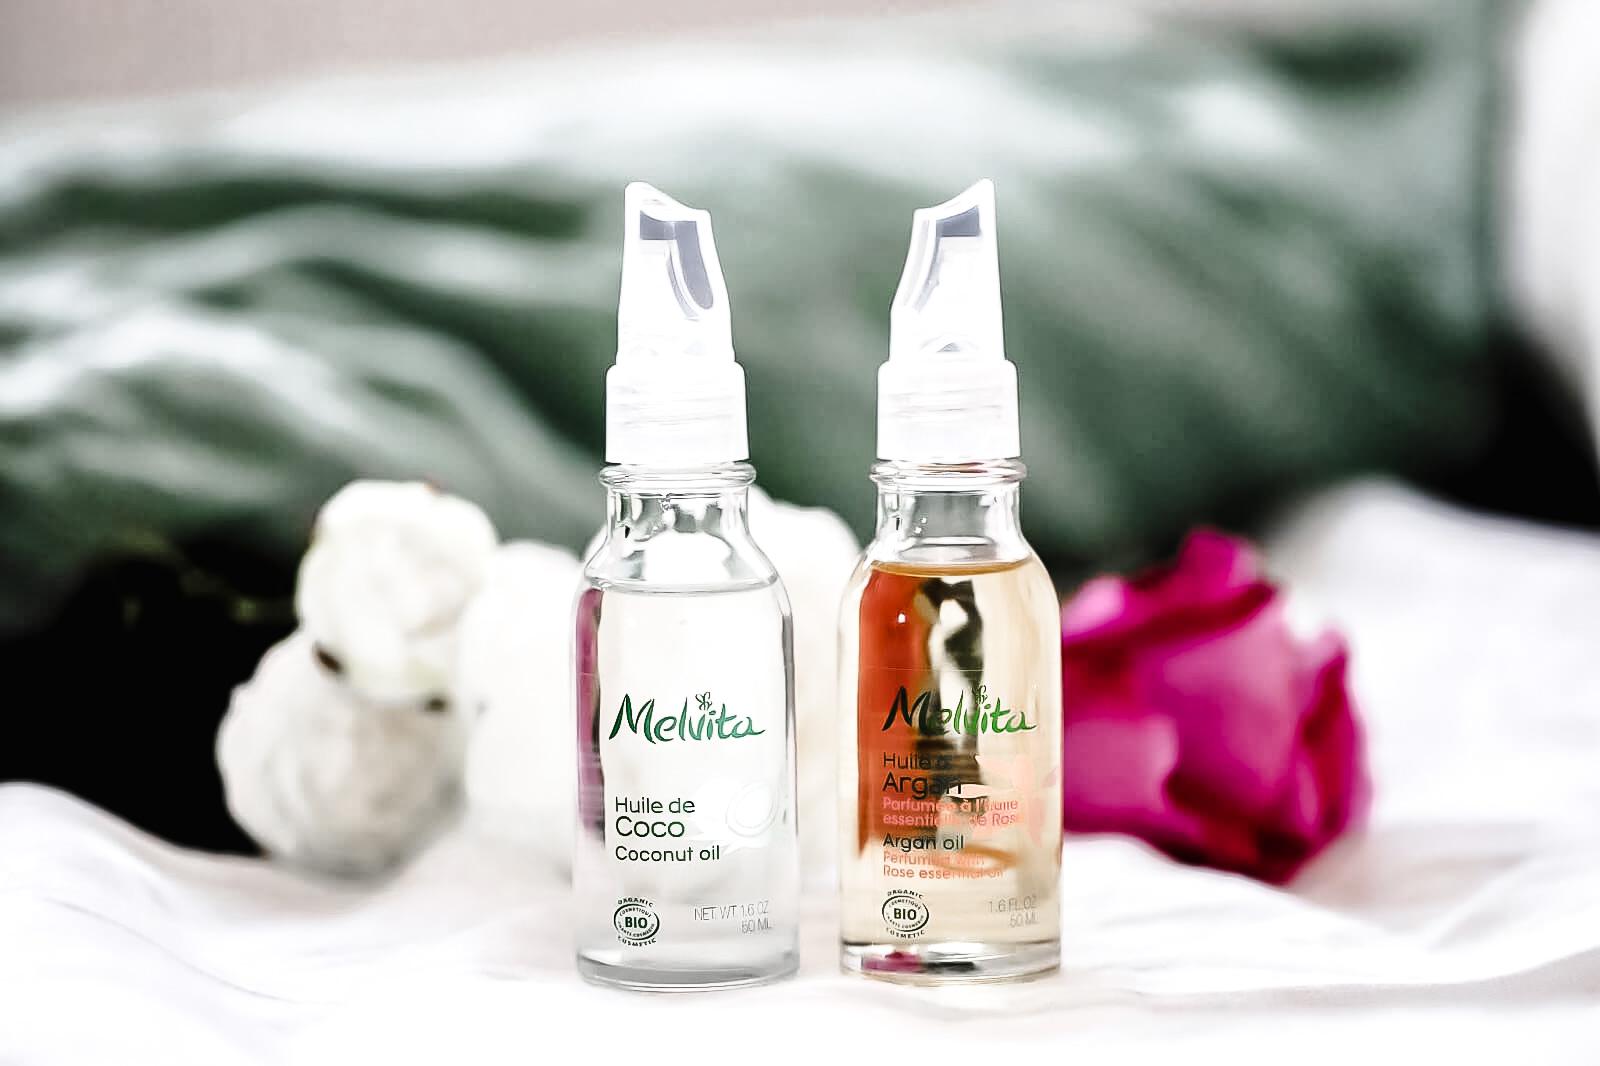 Melvita Huile Coco et Argan Parfumé Rose avis